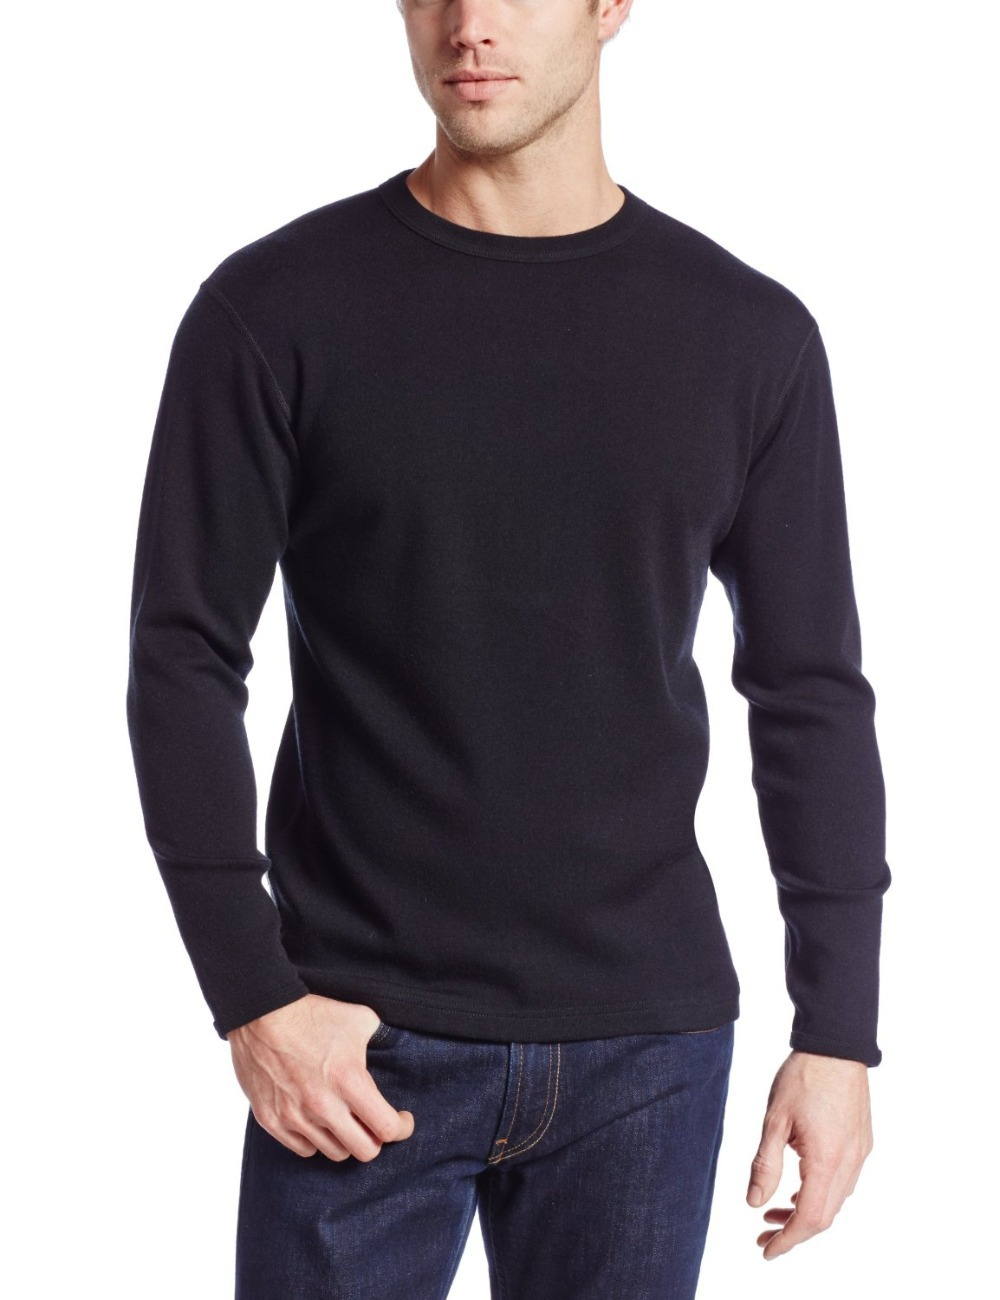 Online Get Cheap Mens Merino Wool Thermal Underwear -Aliexpress ...